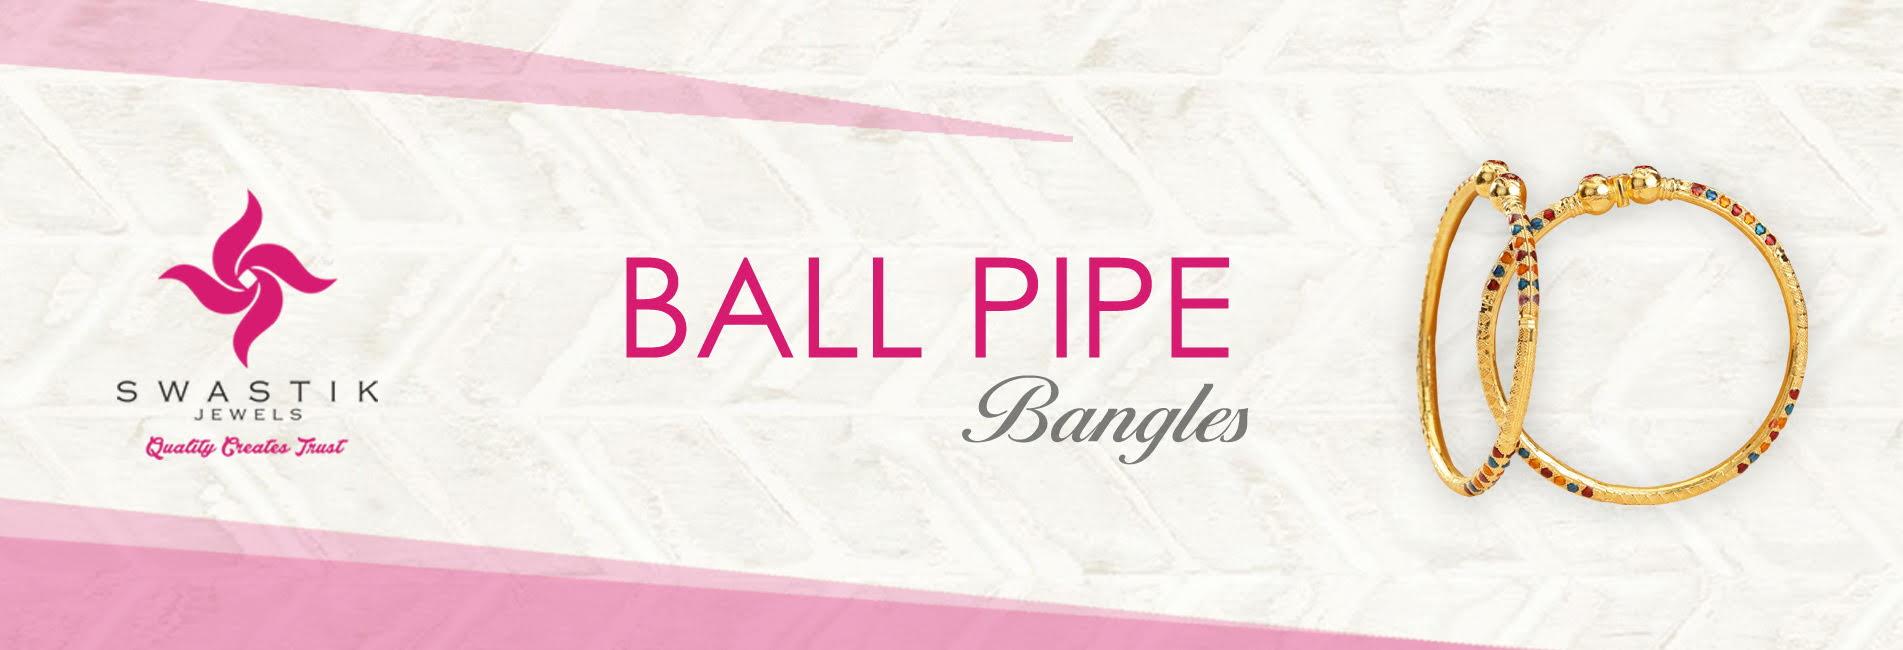 Ball Pipe Bangles